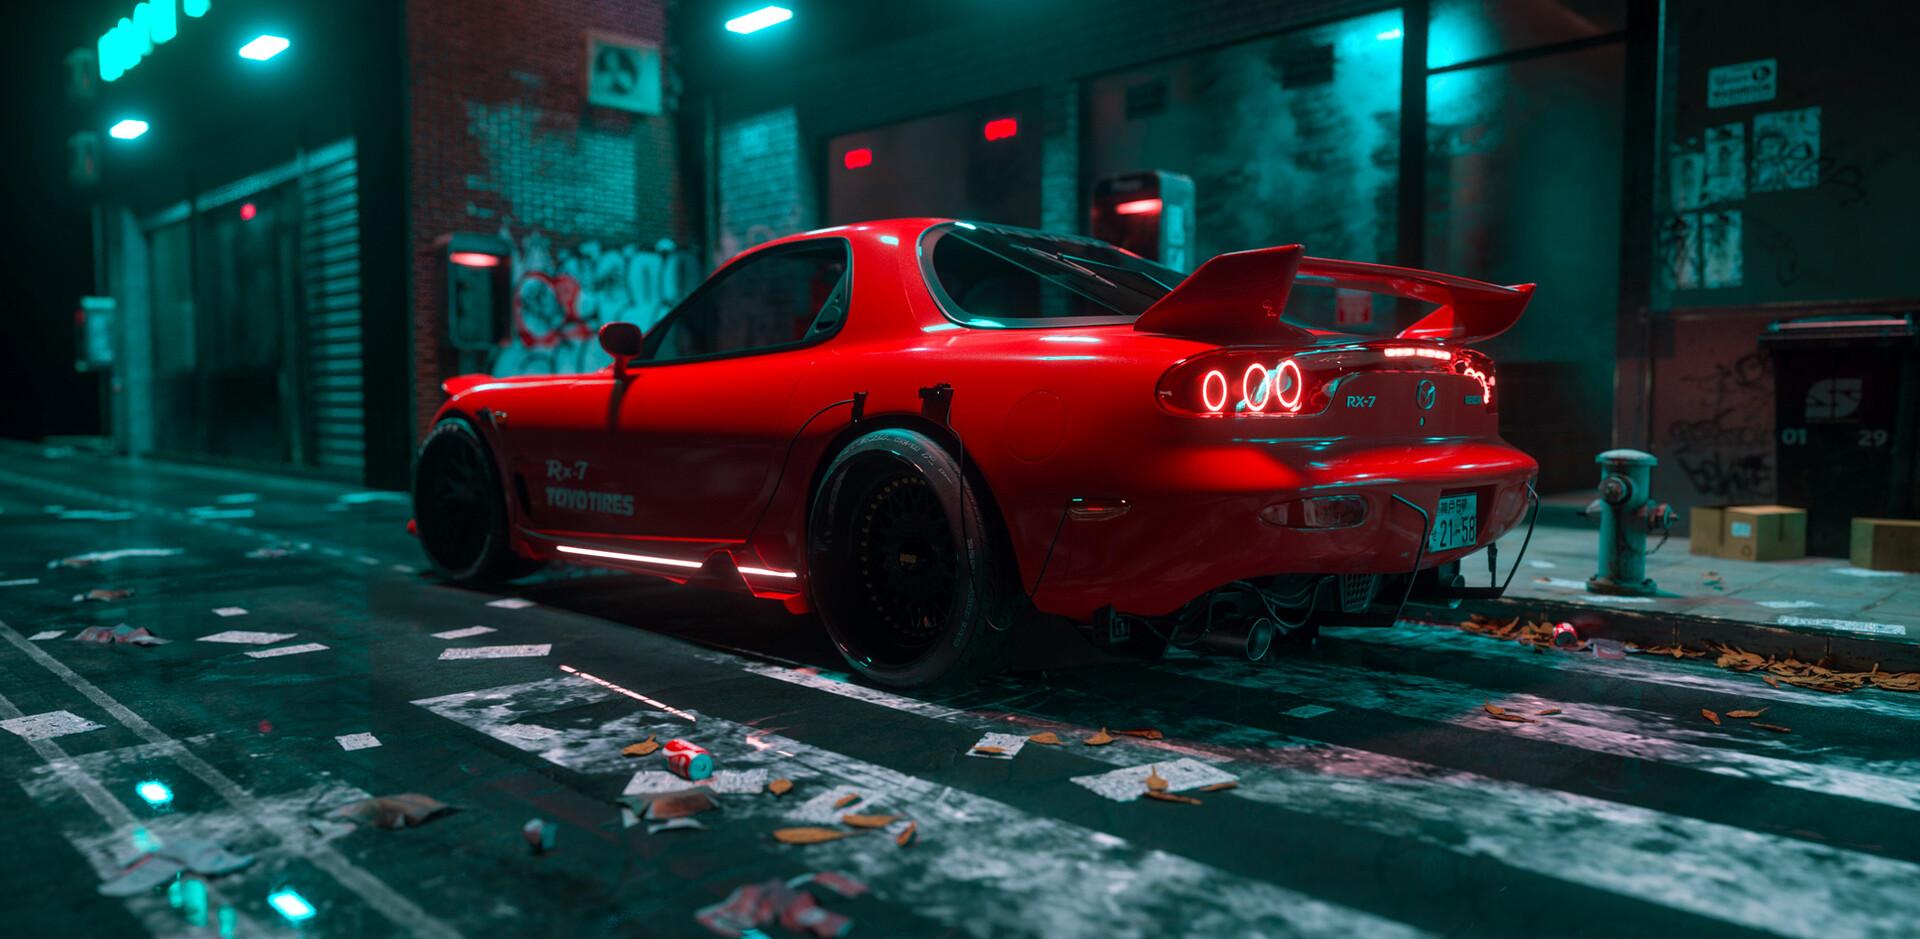 General 1920x939 Mazda RX-7 CGI render red cars vehicle Mazda numbers car synthwave vaporwave